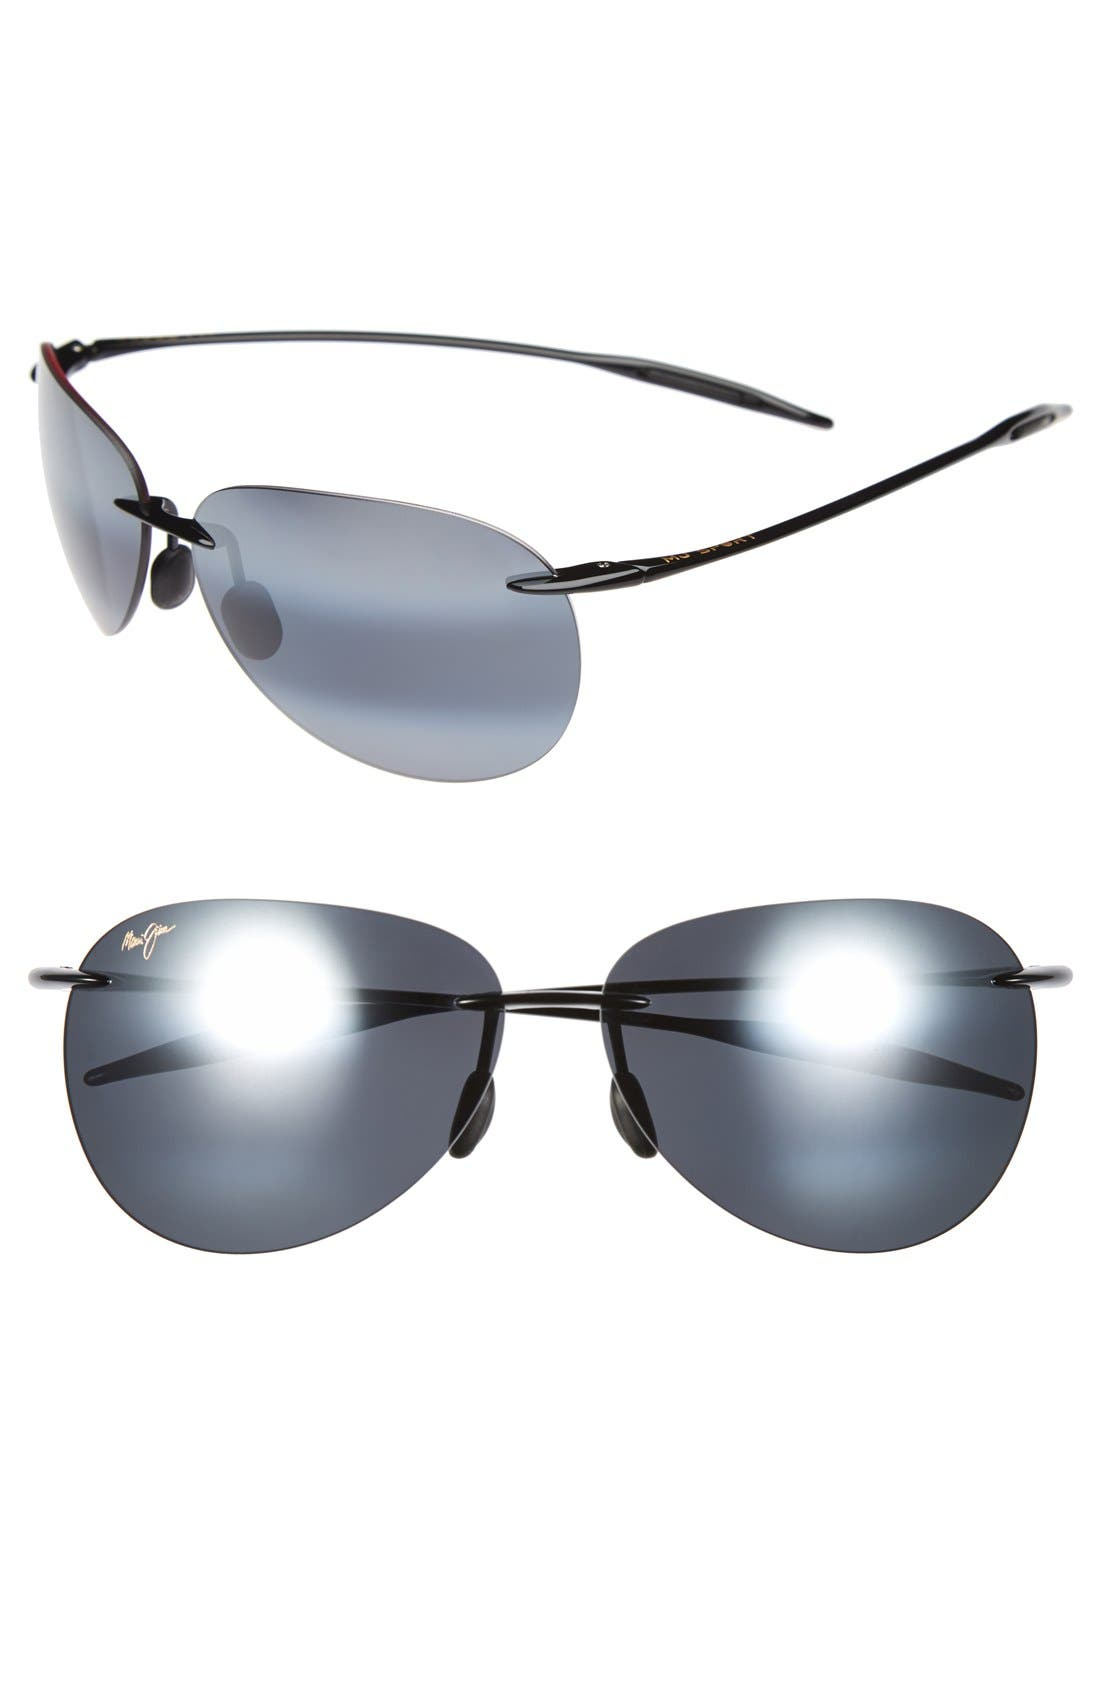 Sugar Beach 62mm PolarizedPlus2<sup>®</sup> Rimless Sunglasses,                         Main,                         color, GLOSS BLACK/ NEUTRAL GREY